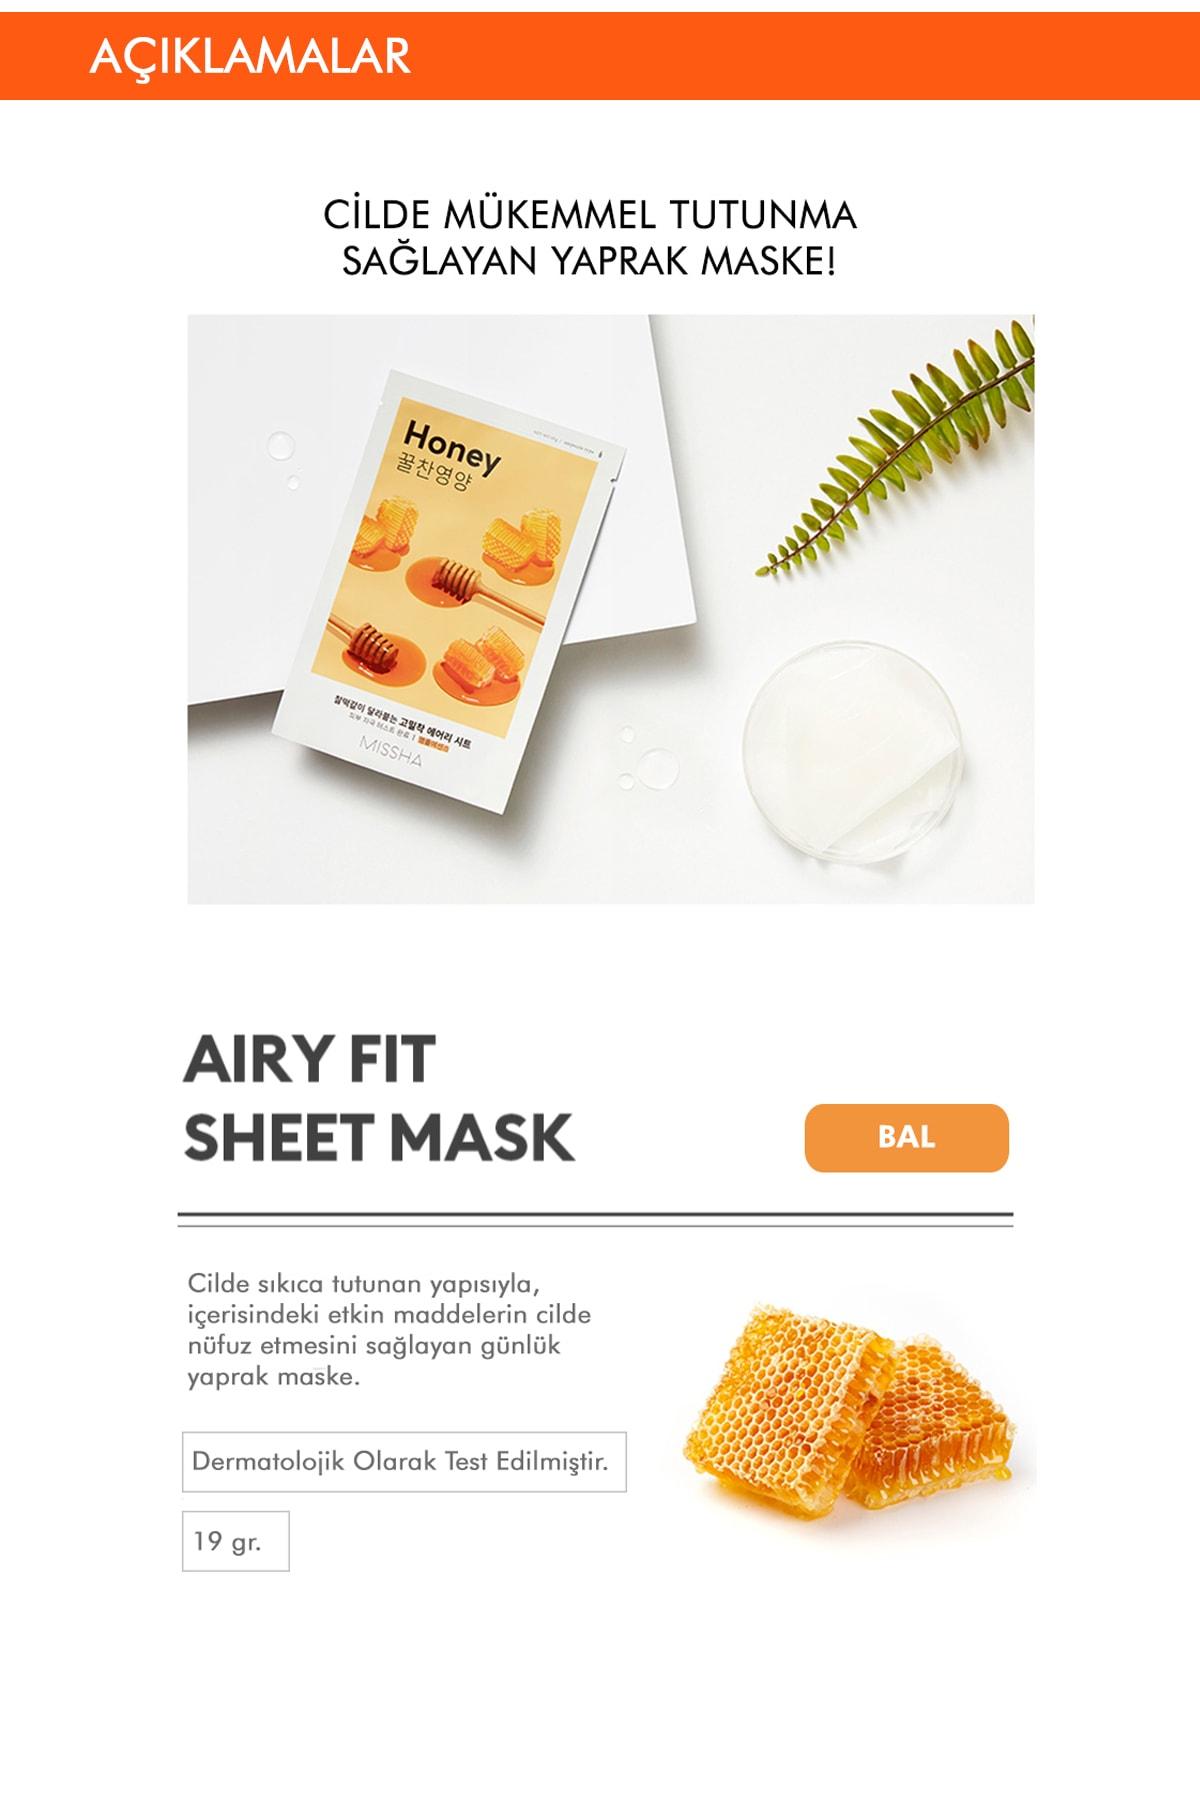 Missha Bal İçerikli Yoğun Nemlendirici Yaprak Maske (1ad) Airy Fit Sheet Mask Honey 1